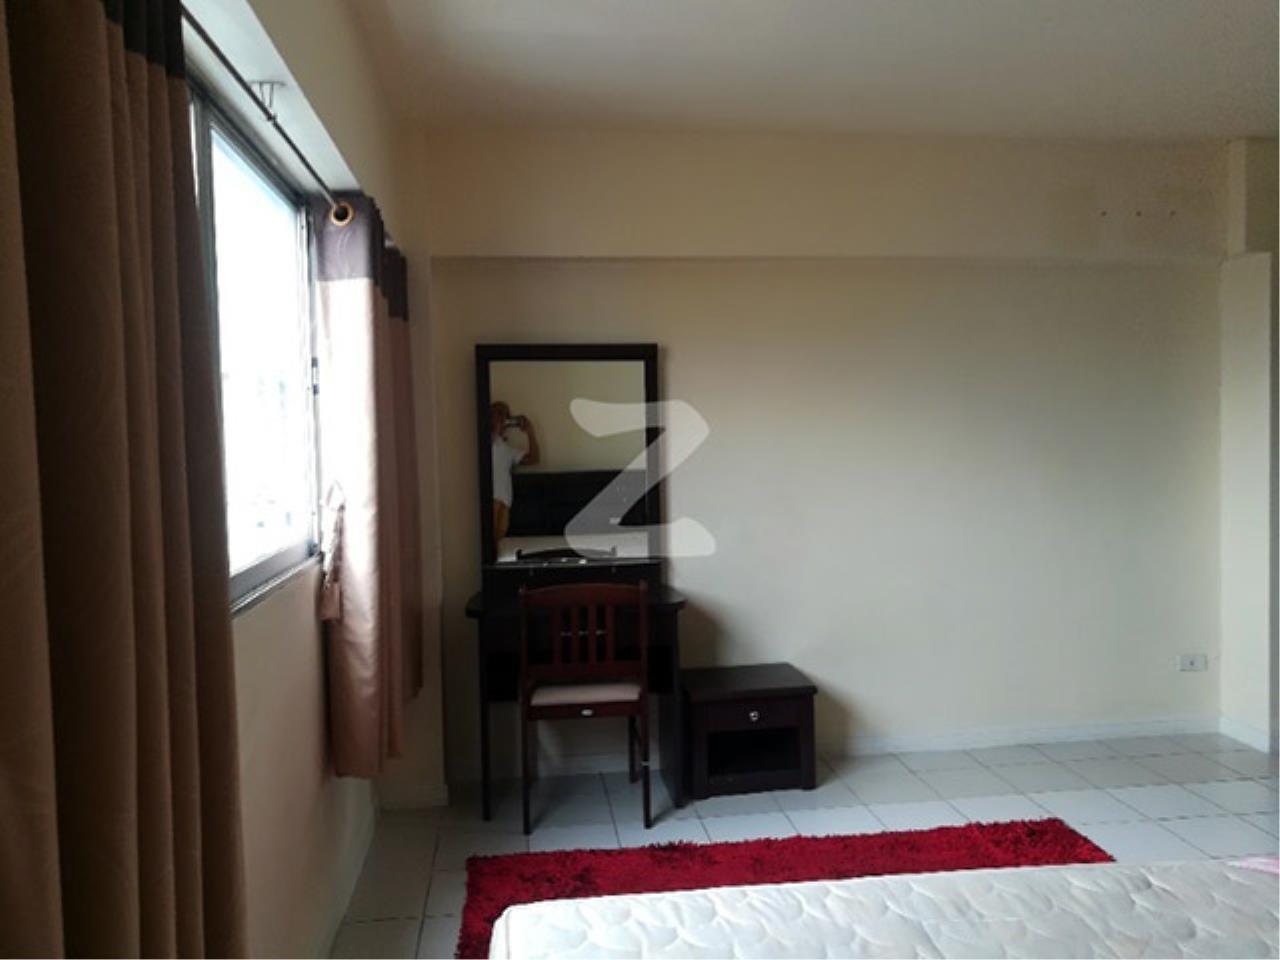 Agent - Sarunya jantanakorn Agency's BE0034 Condo for Sale Lumpini Center Happyland fl.6th 43 sqm 1 bed near The Mall Bangkapi 2